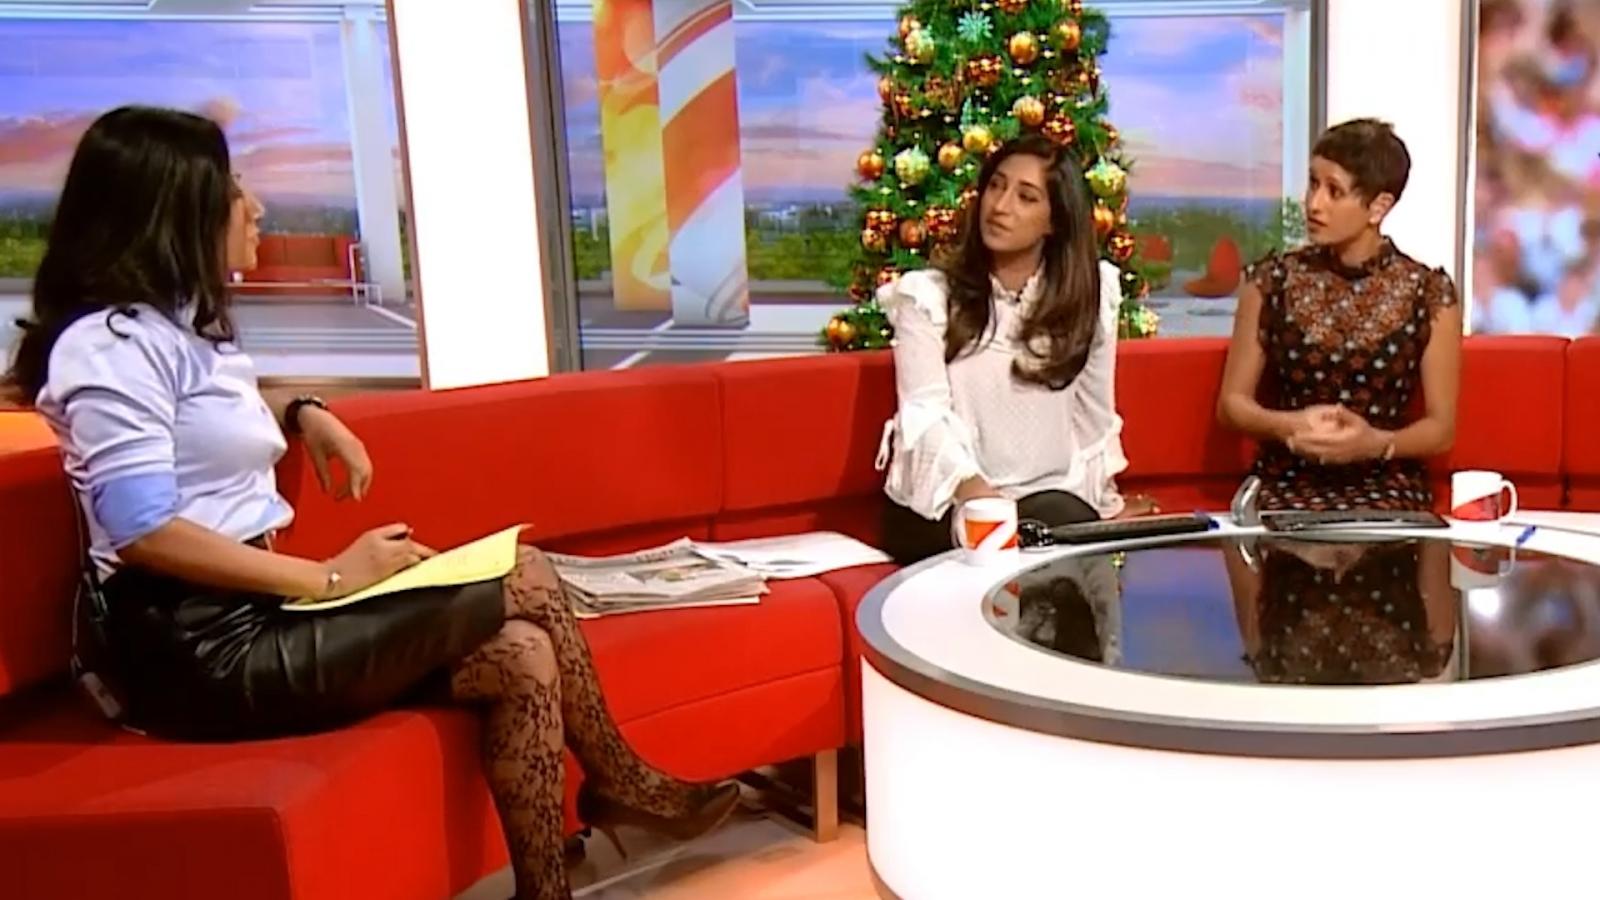 BBC Breakfast show presented by three Asian women